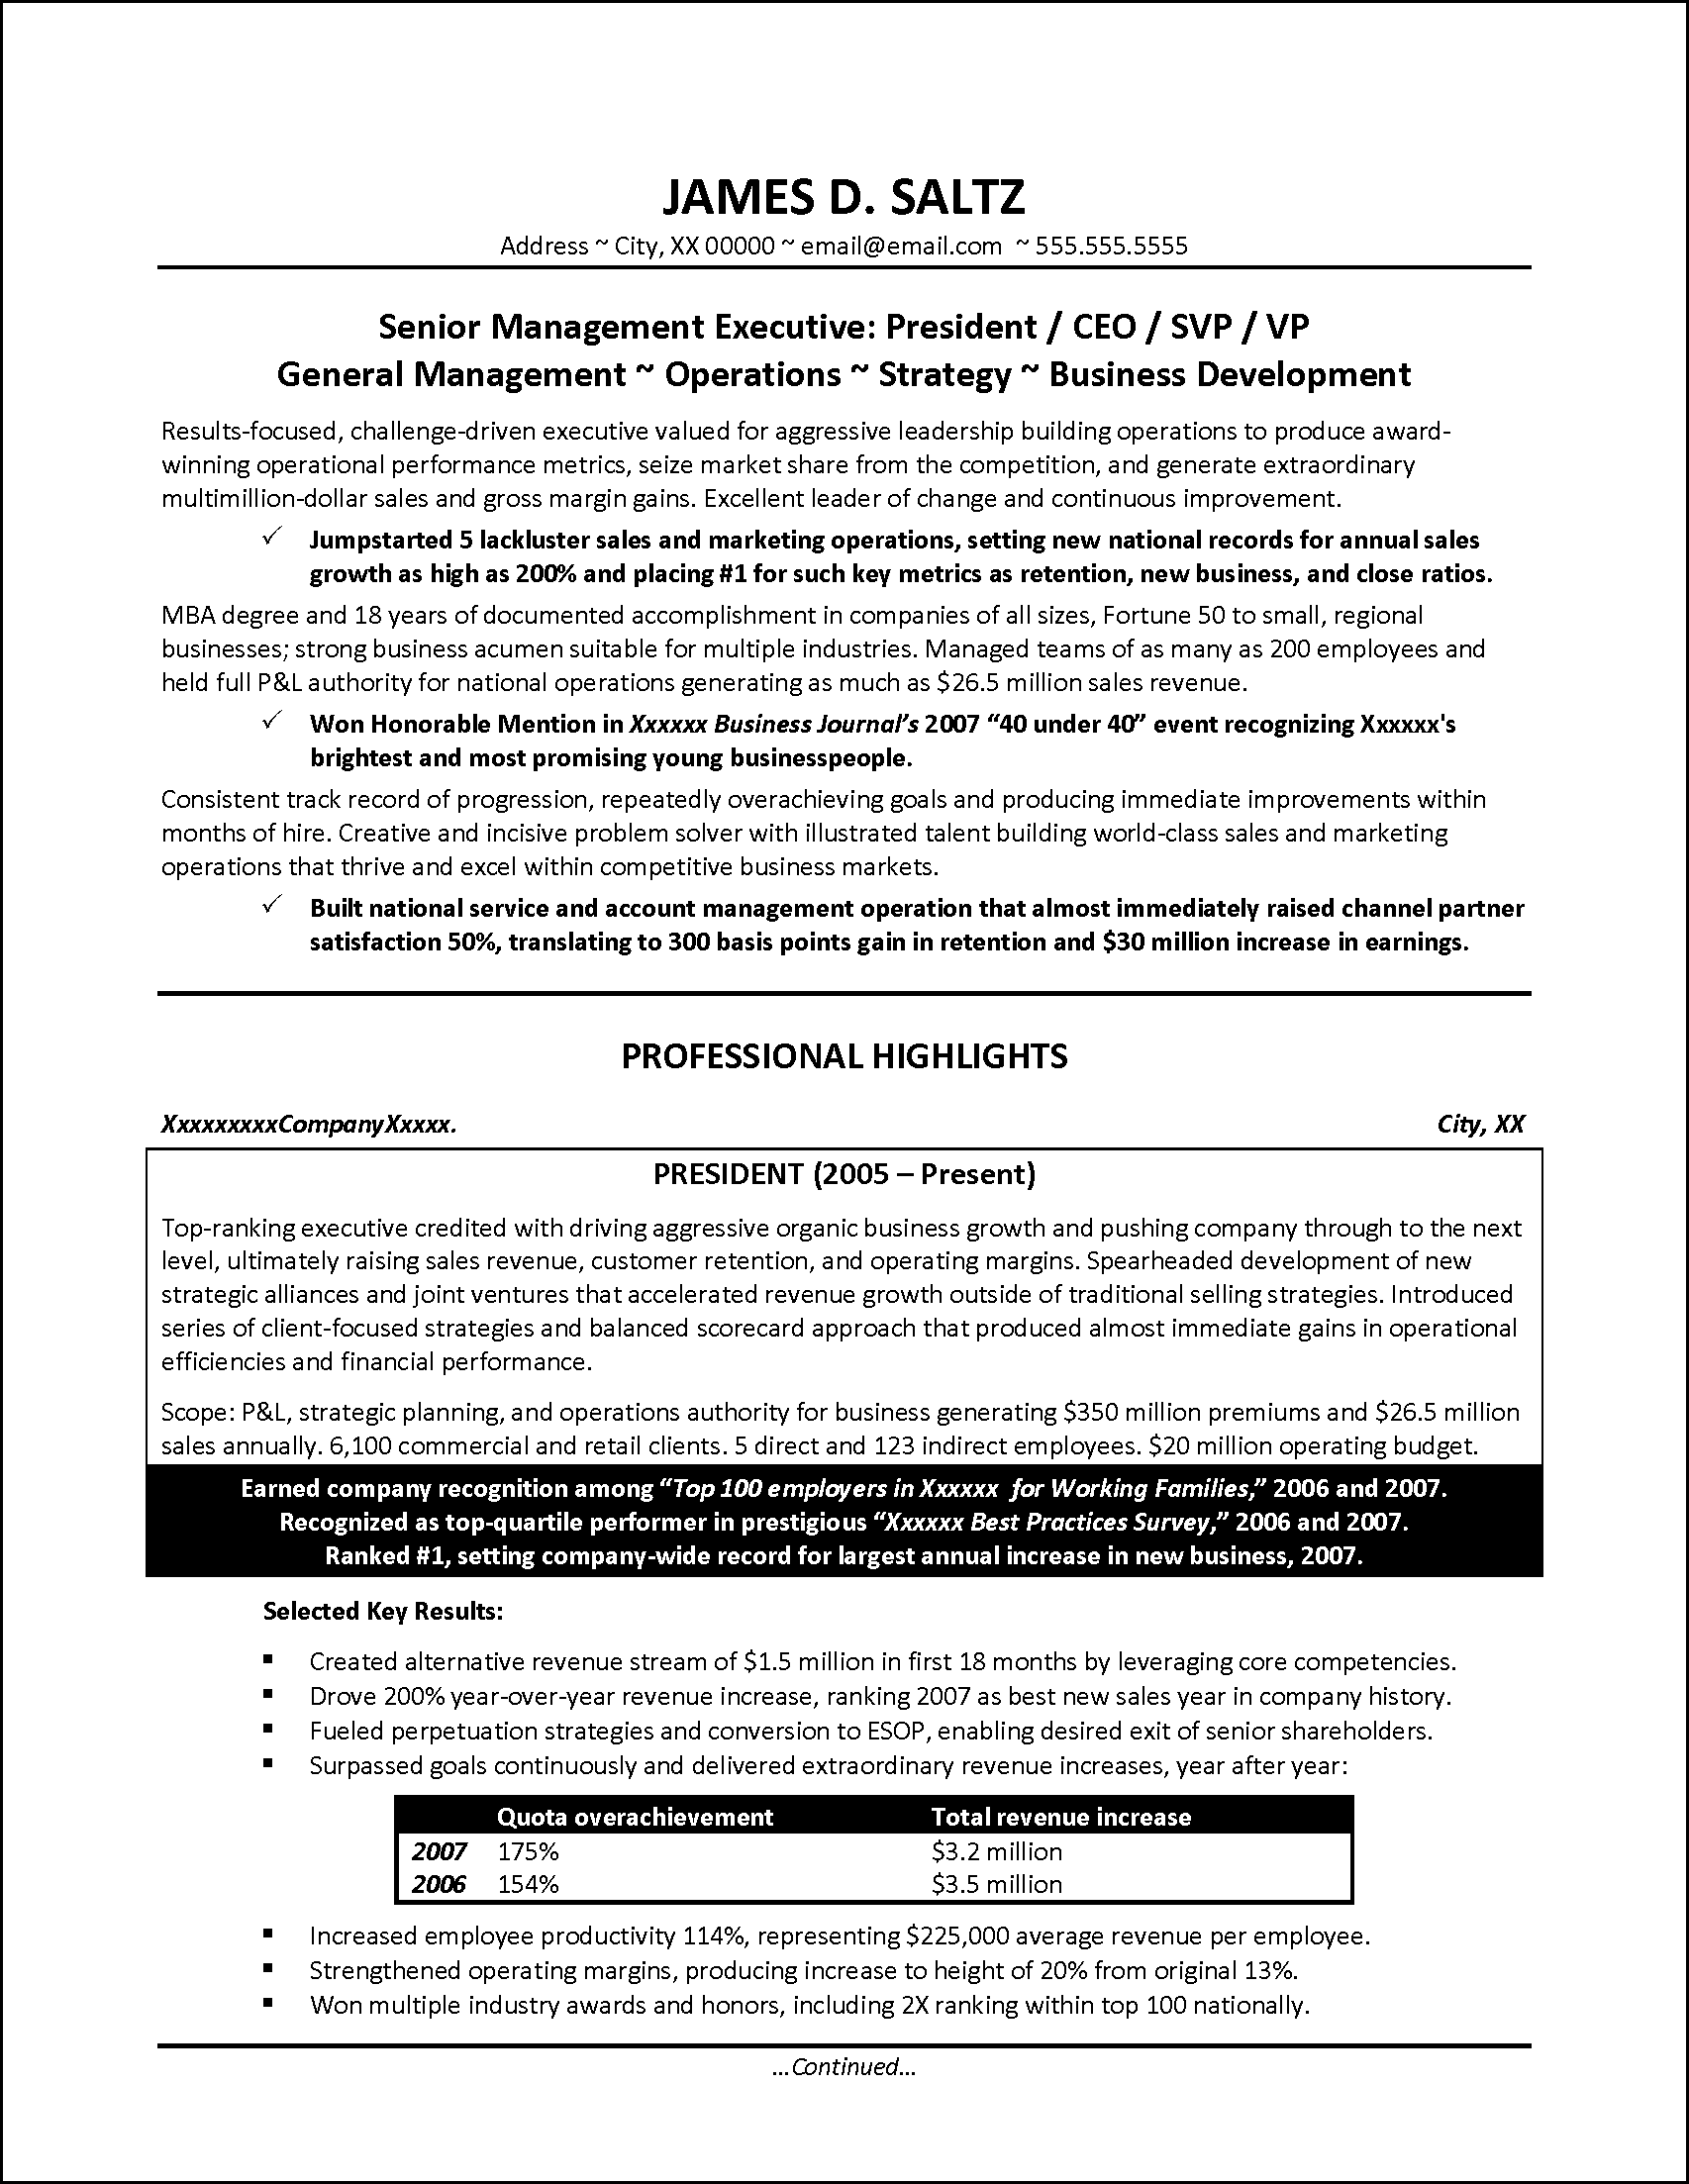 Senior Manager Resume Example